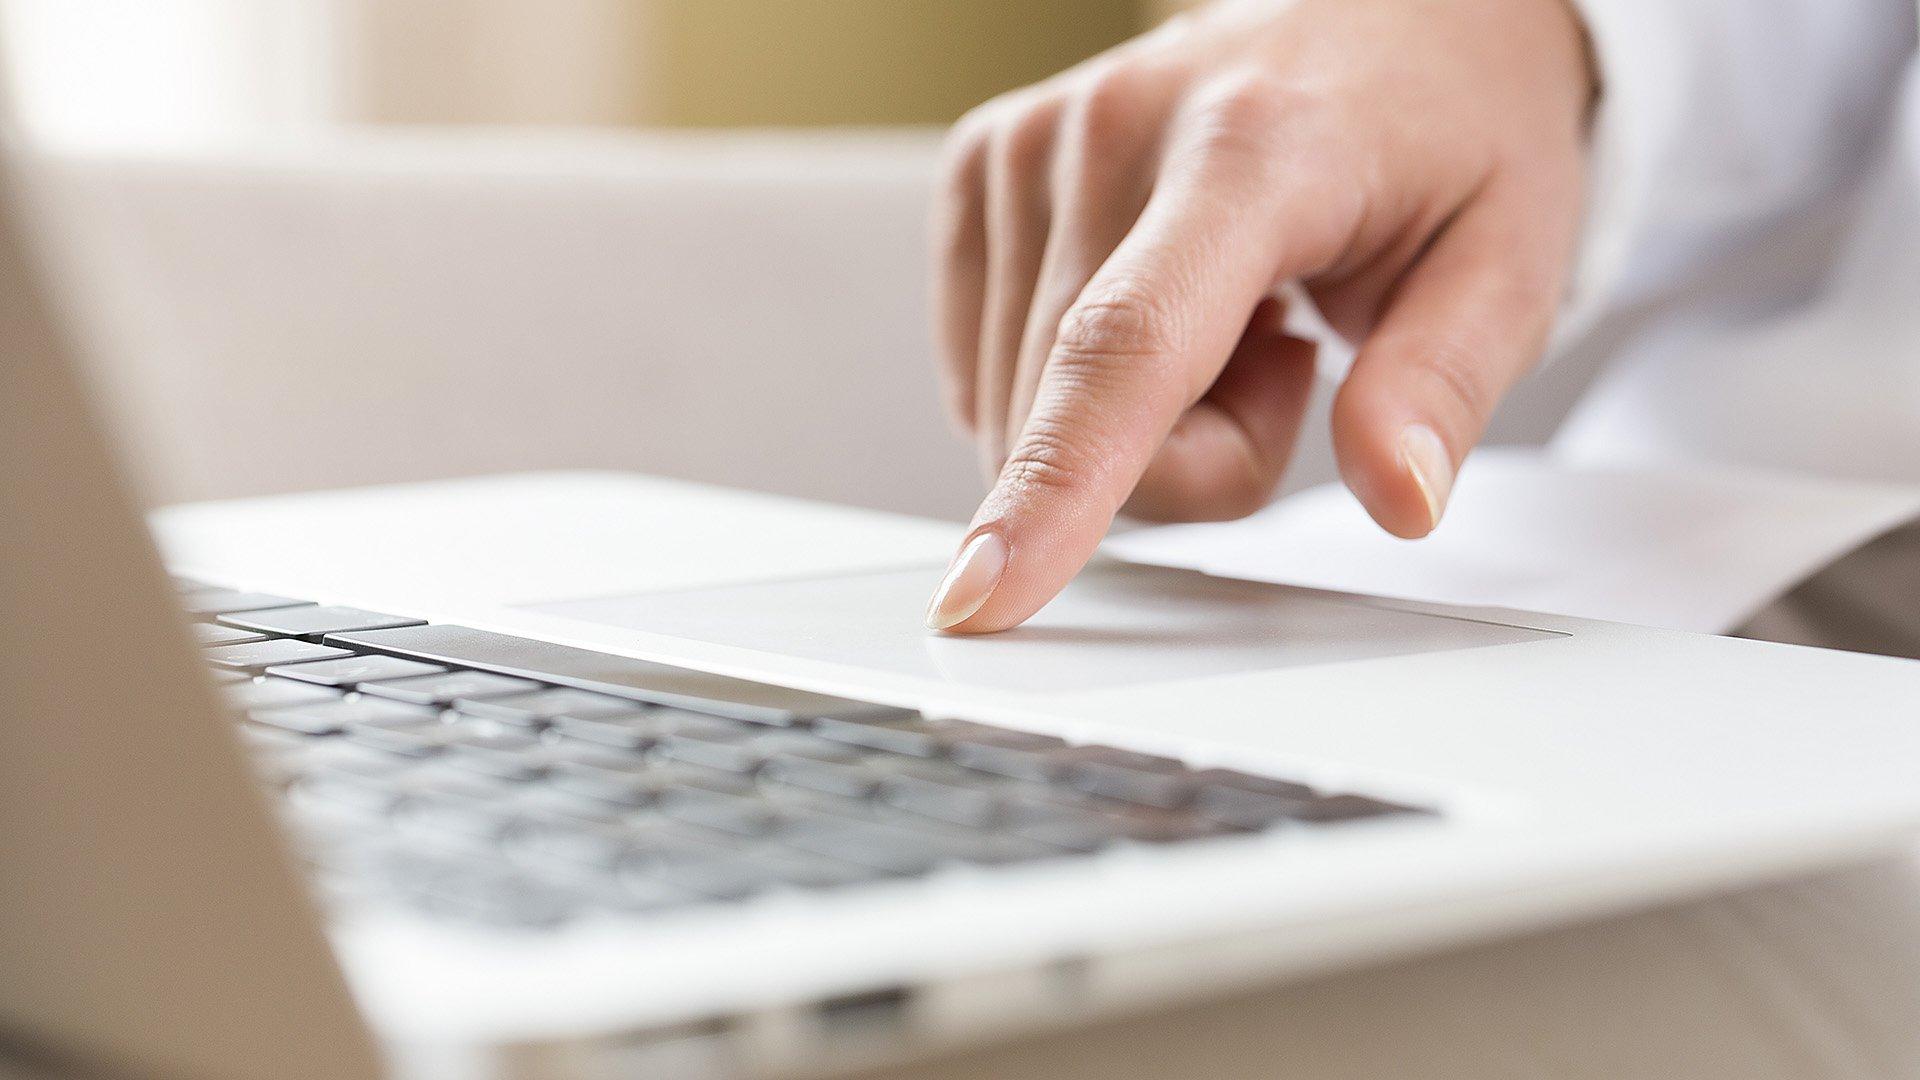 macbook-trackpad-scroll